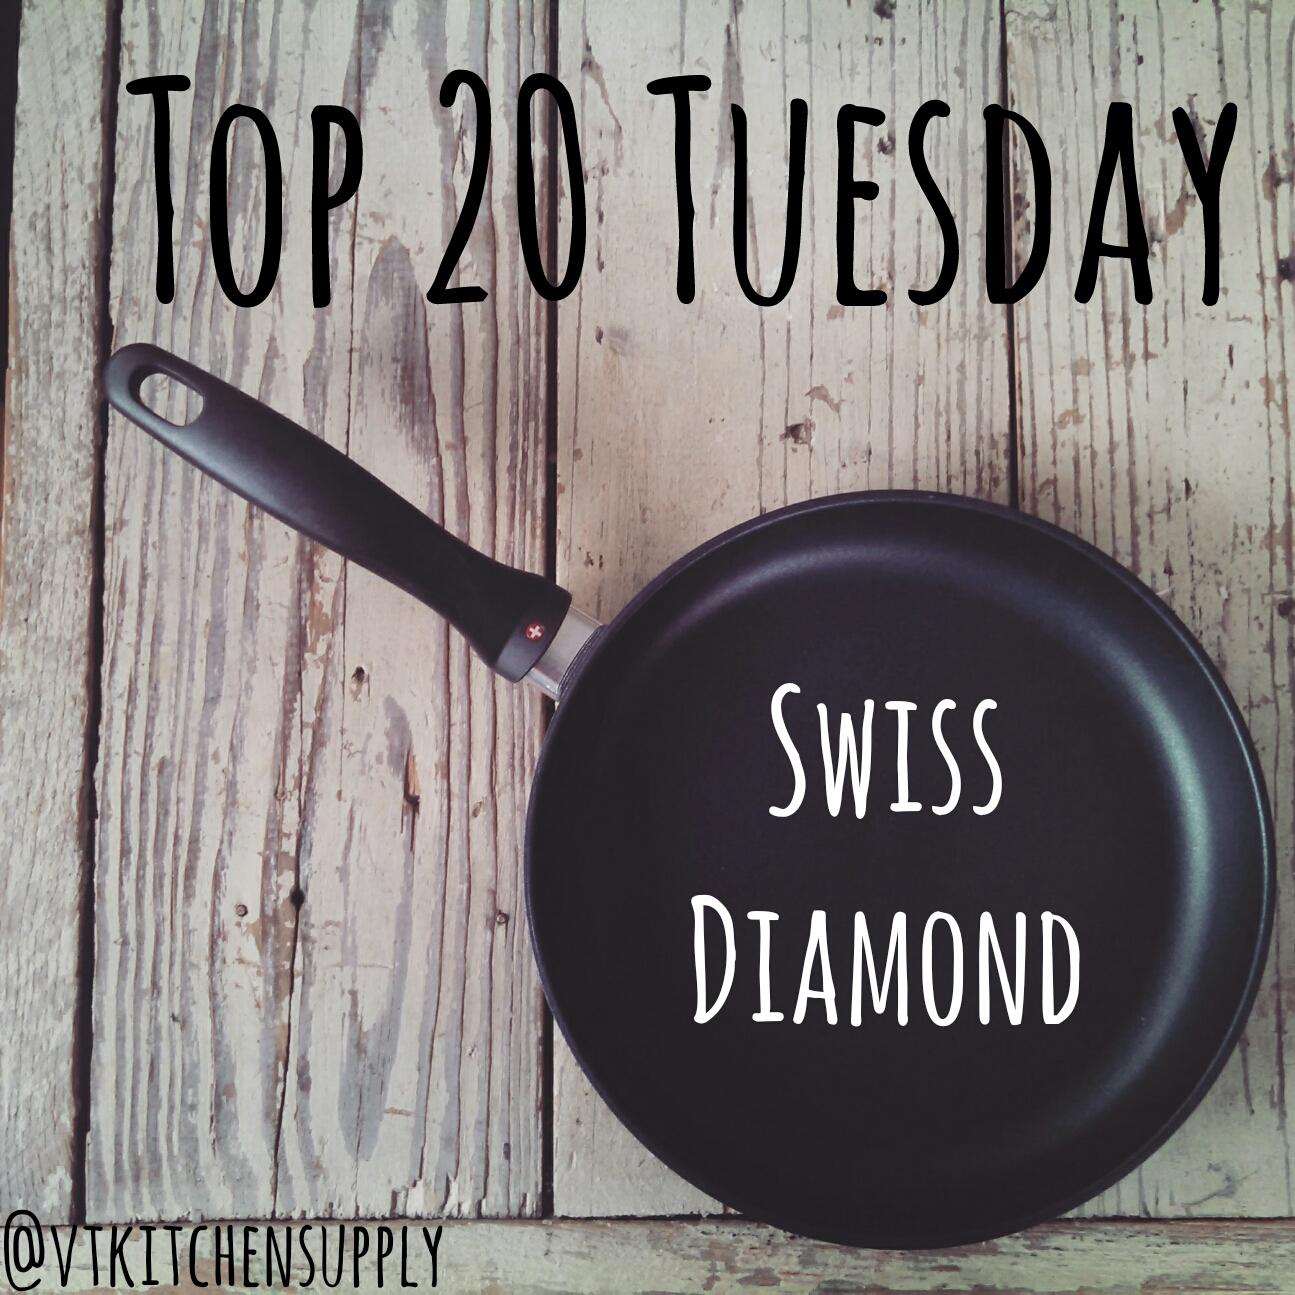 Top 20 Tuesday | Swiss Diamond Cookware